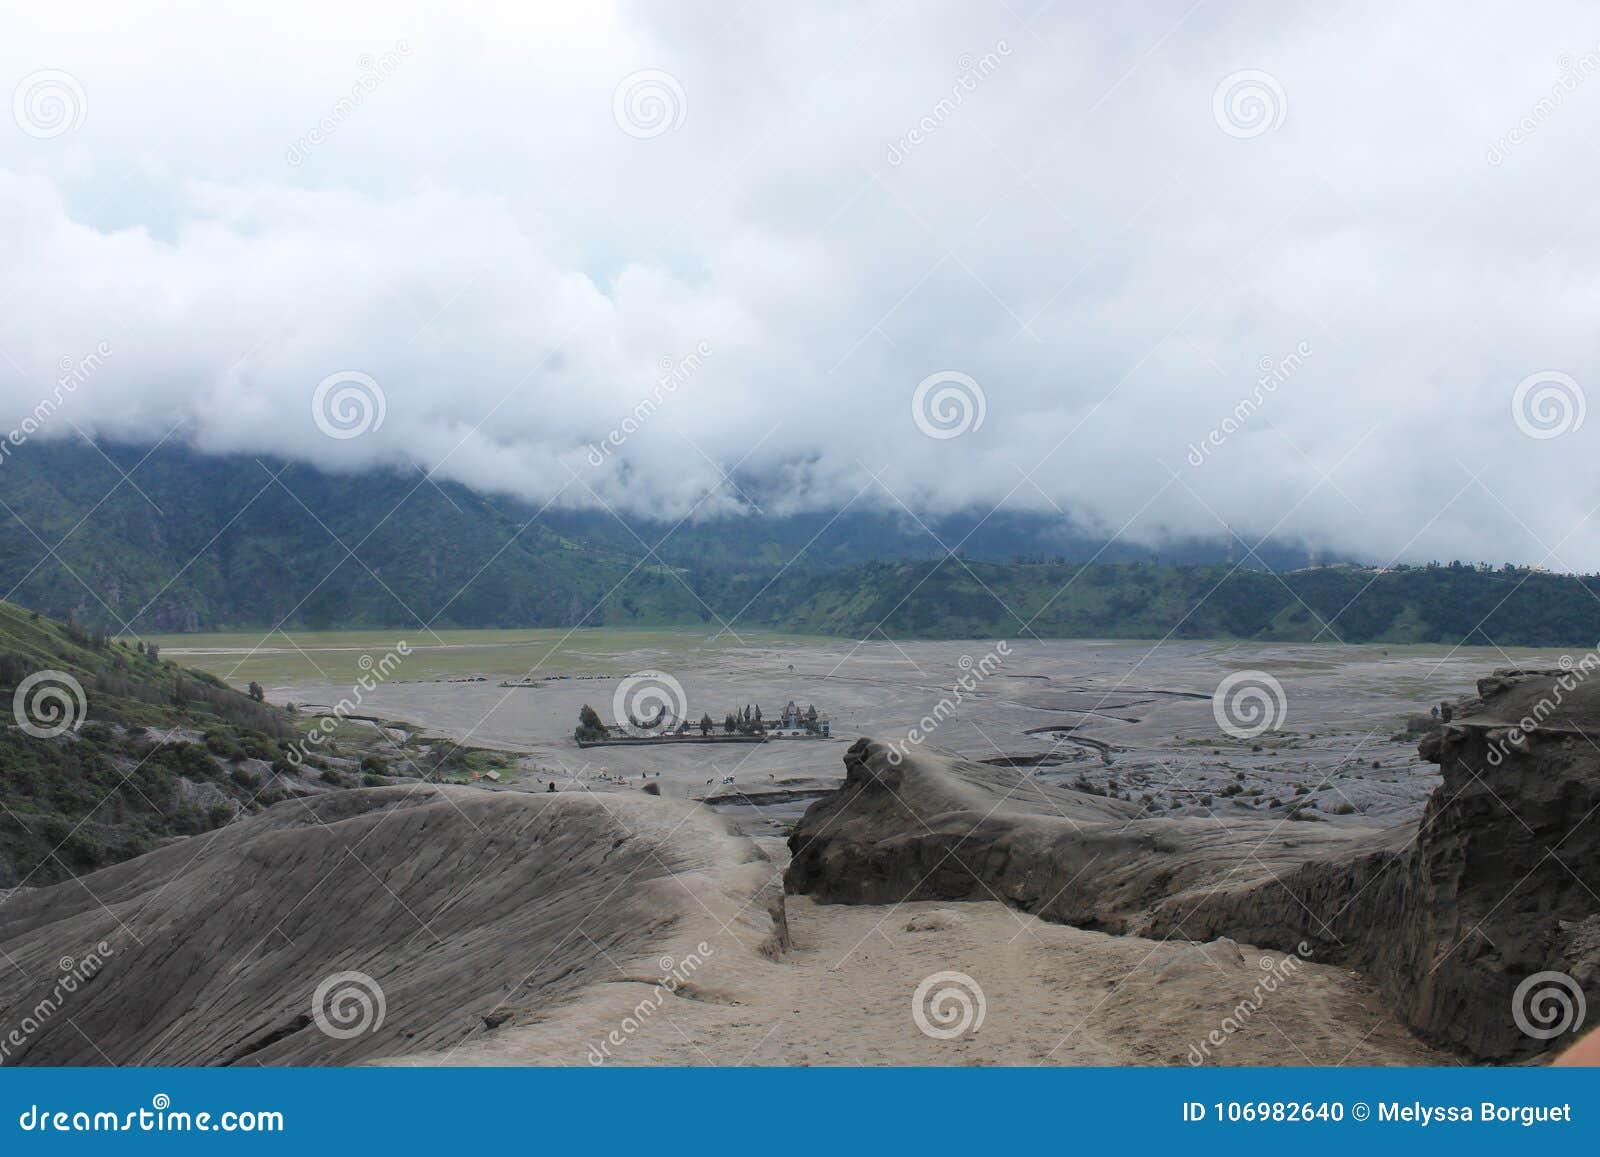 Volcano Mount Bromo Eruption, Java Indonesia orientale